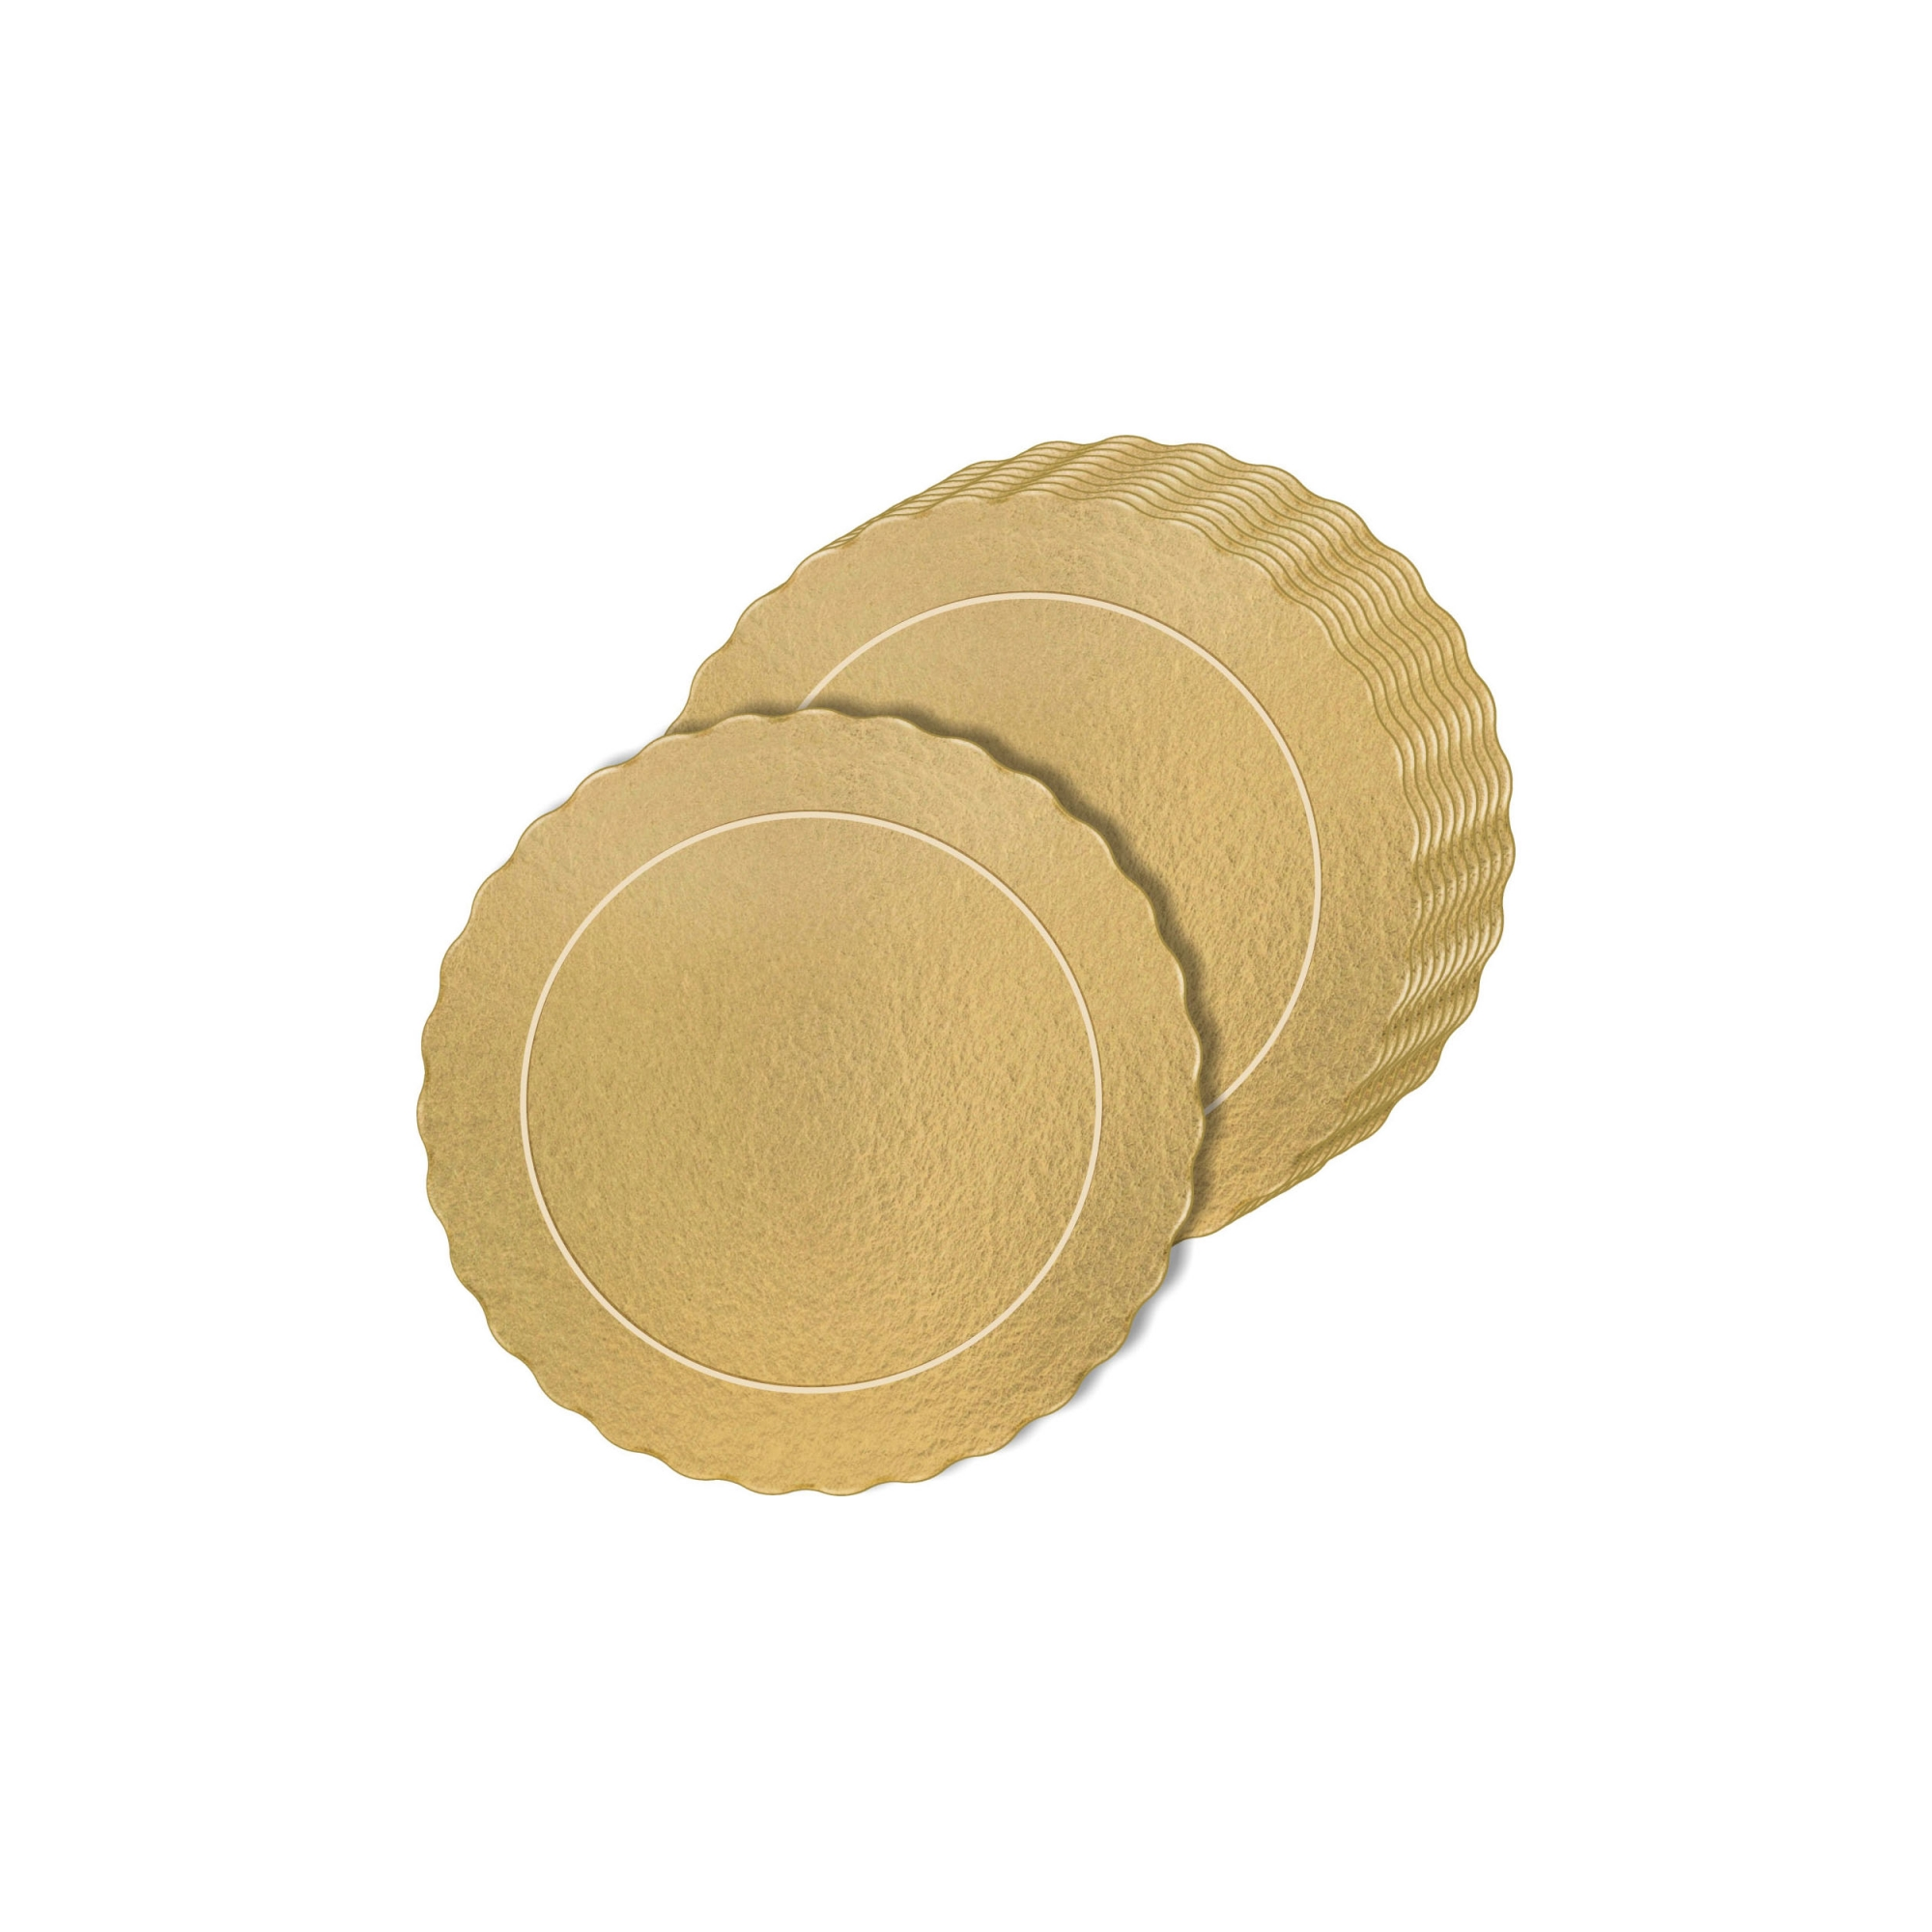 100 Bases Laminadas, Suporte P/ Bolo, Cake Board, Kit 25 e 28 cm - Ouro